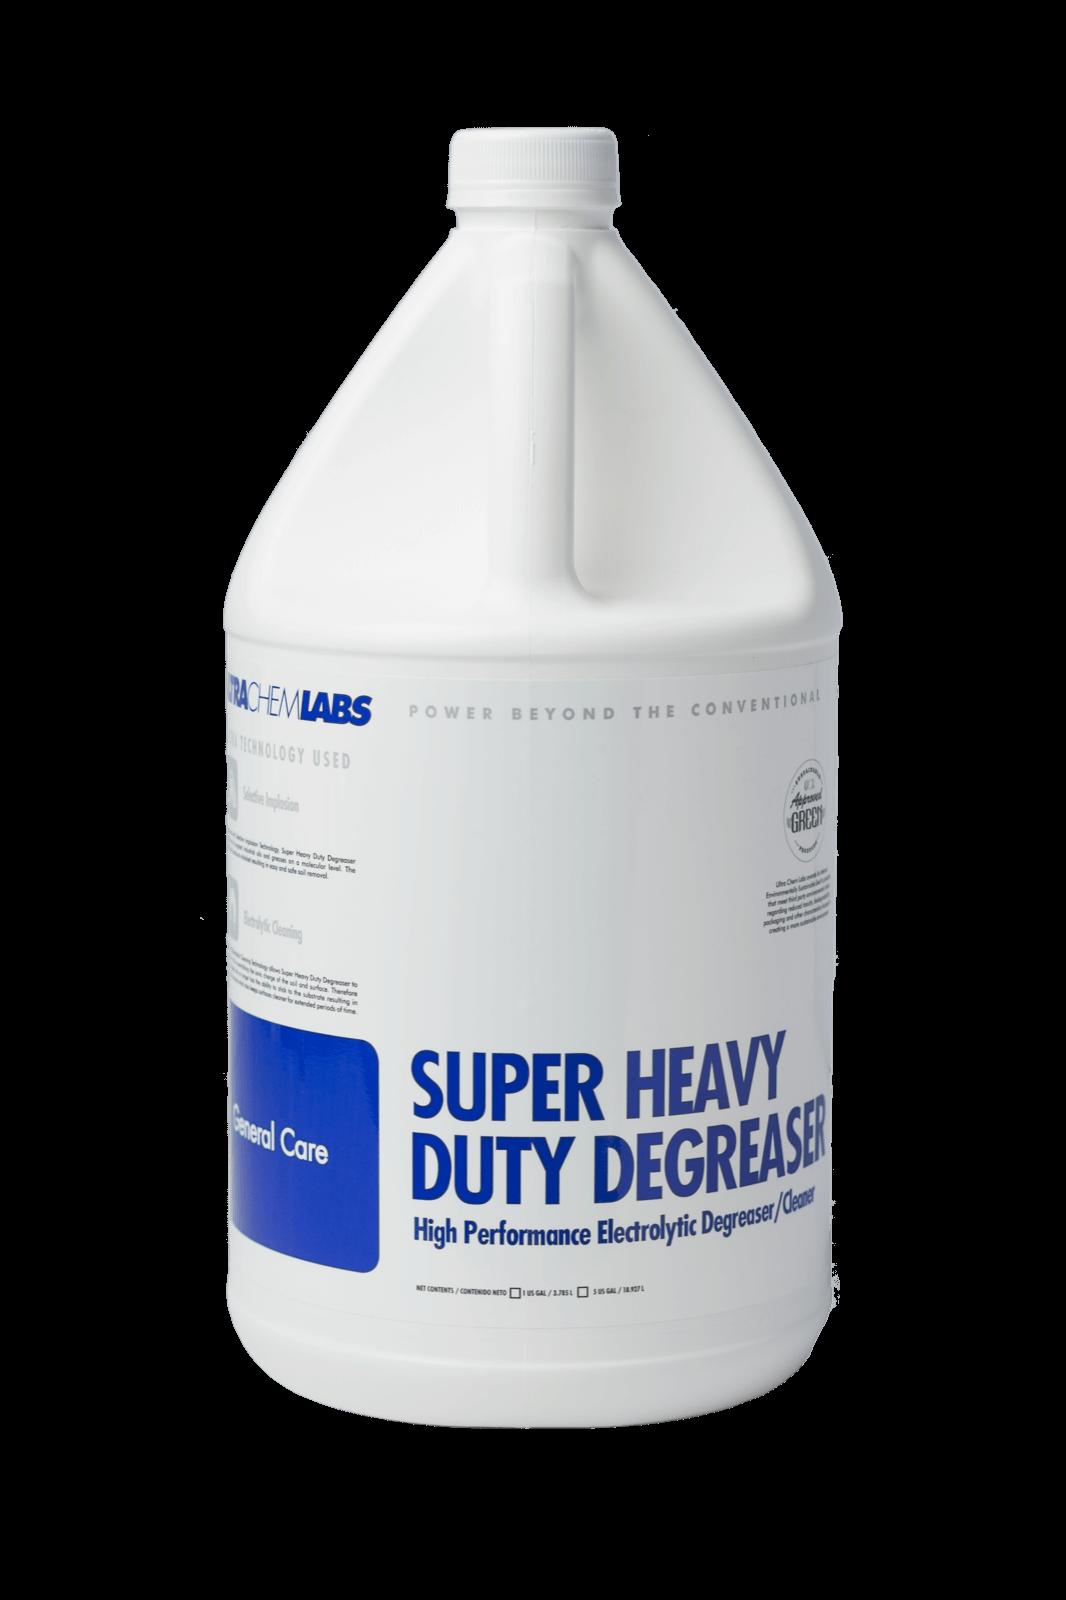 Heavy Duty Degreaser >> Super Heavy Duty Degreaser Scalzo Clean